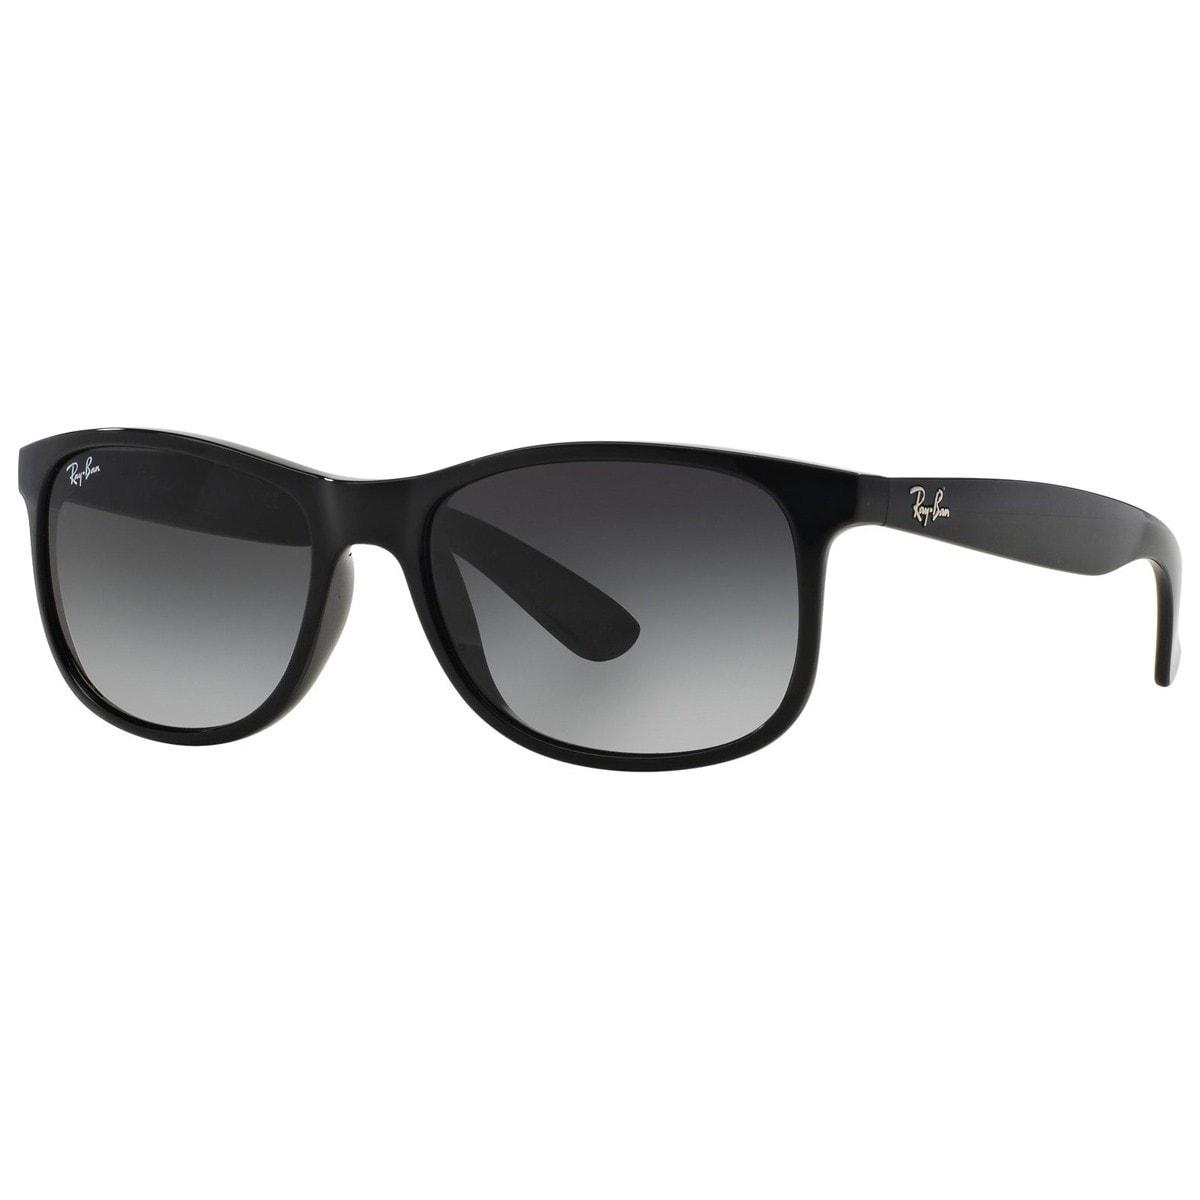 80f4bded16 Ray-Ban RB4202 601 8G 55mm Grey Gradient Lenses Black Frame Sunglasses